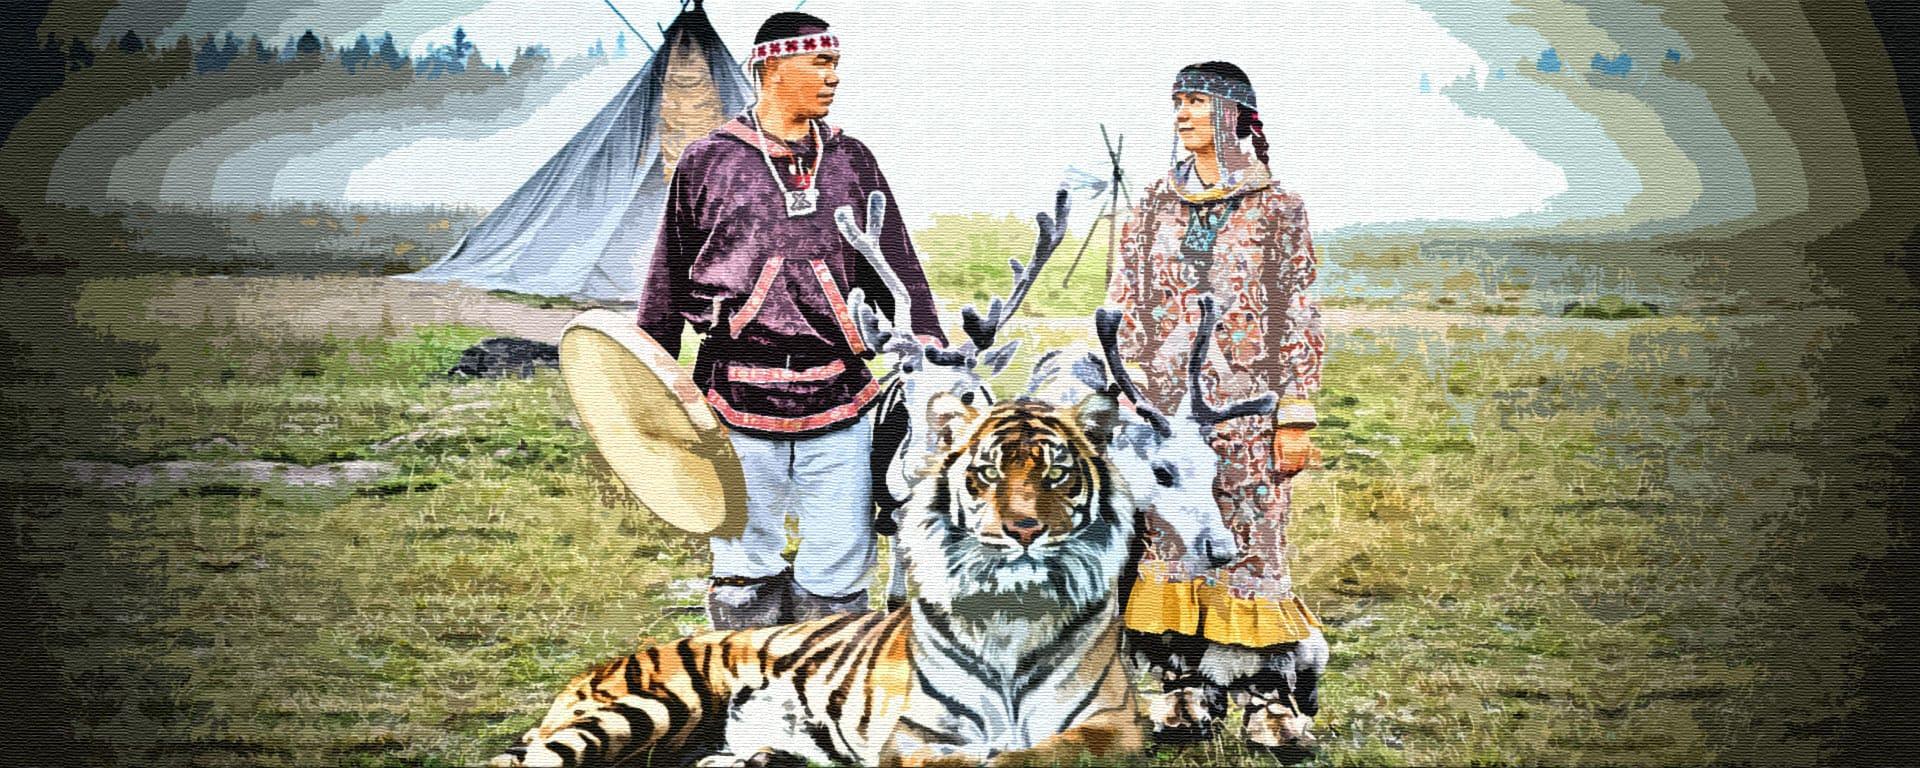 Паренёк и тигр